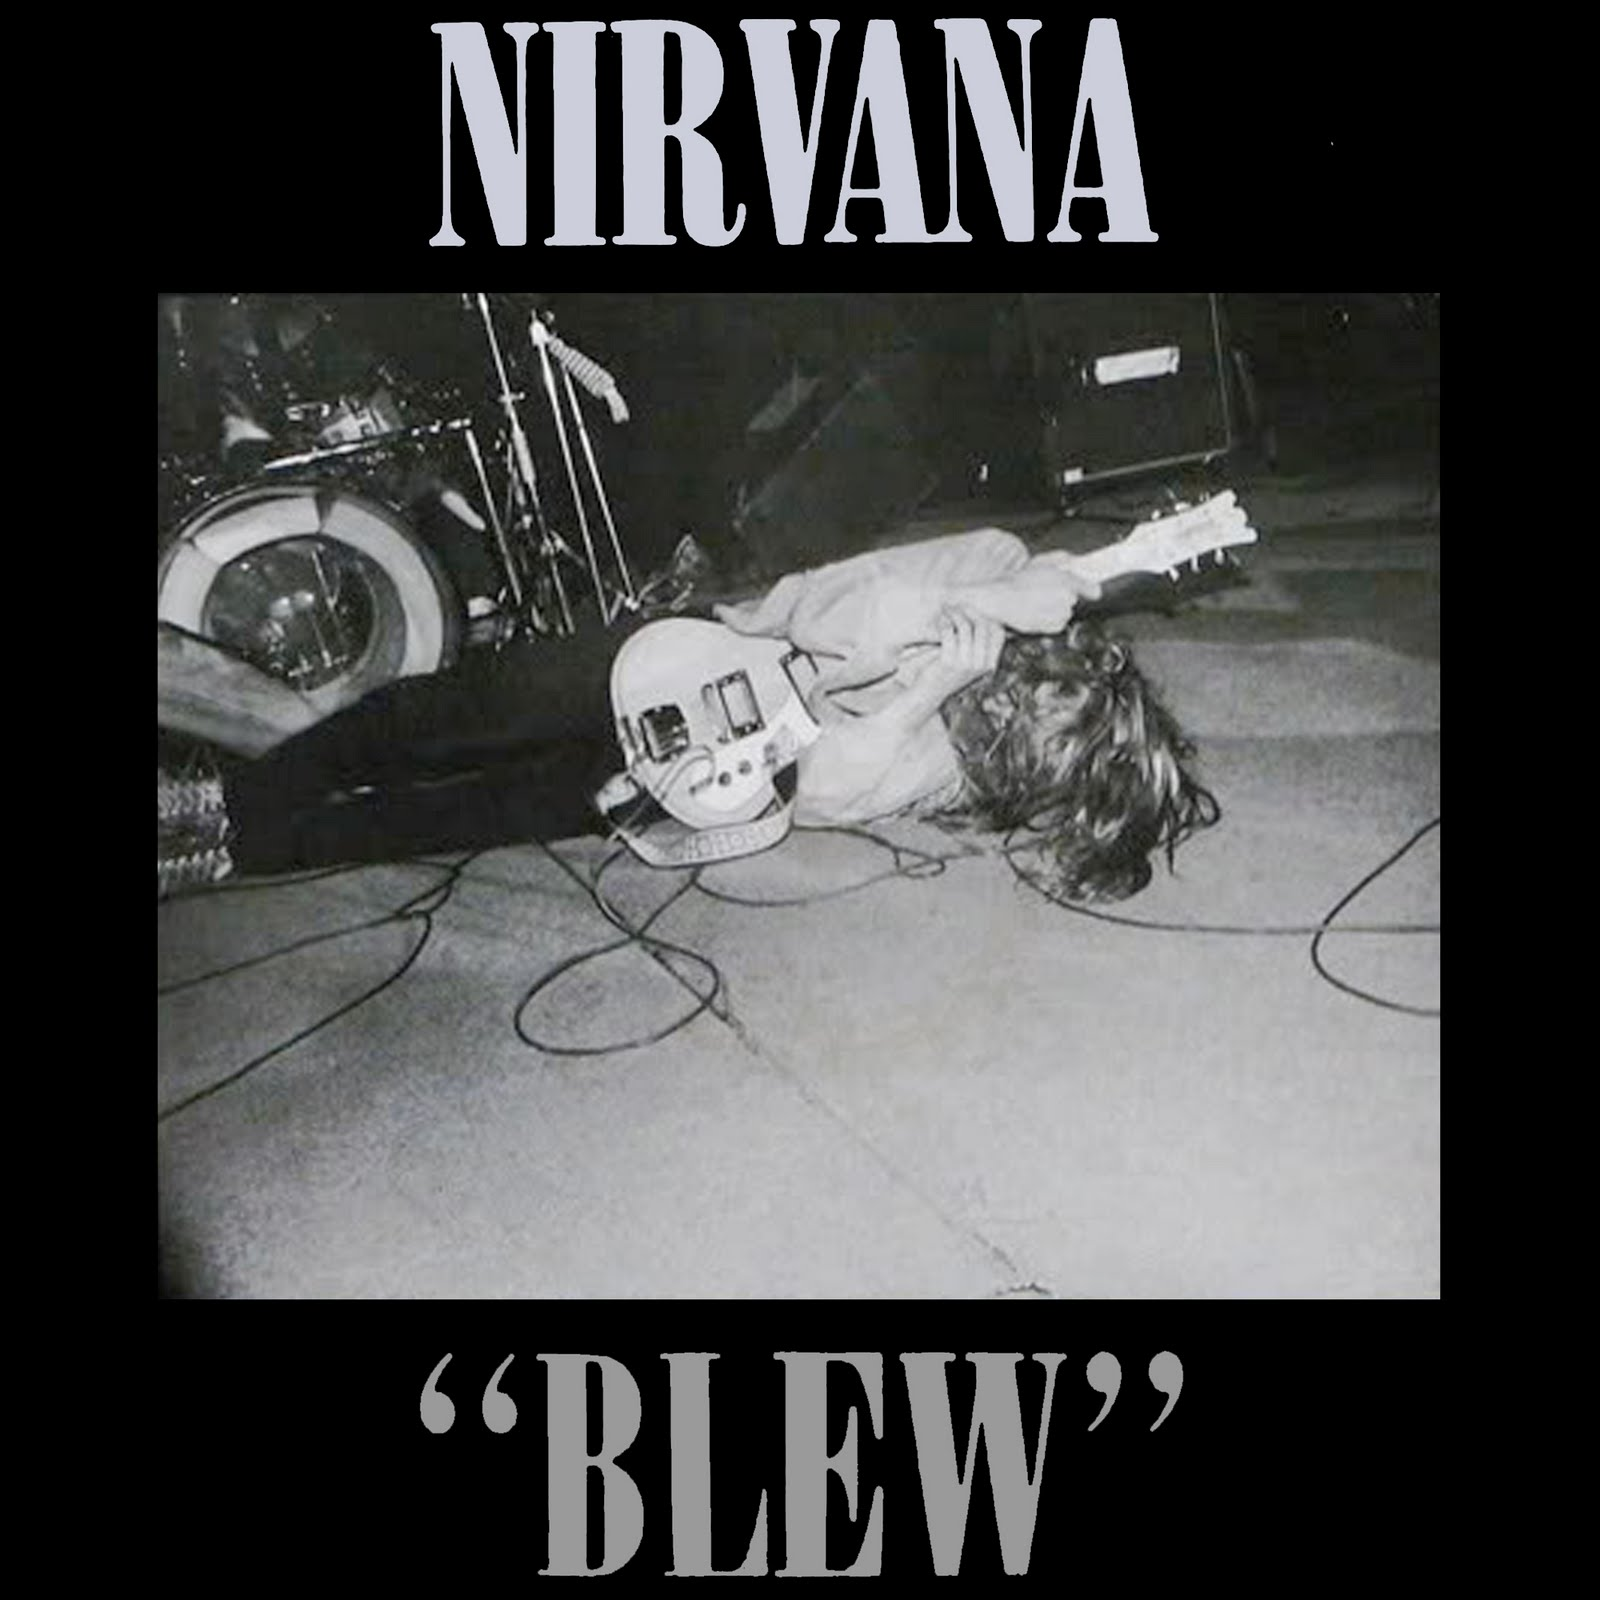 Nirvana love buzz live in austria 1989 - 5 7